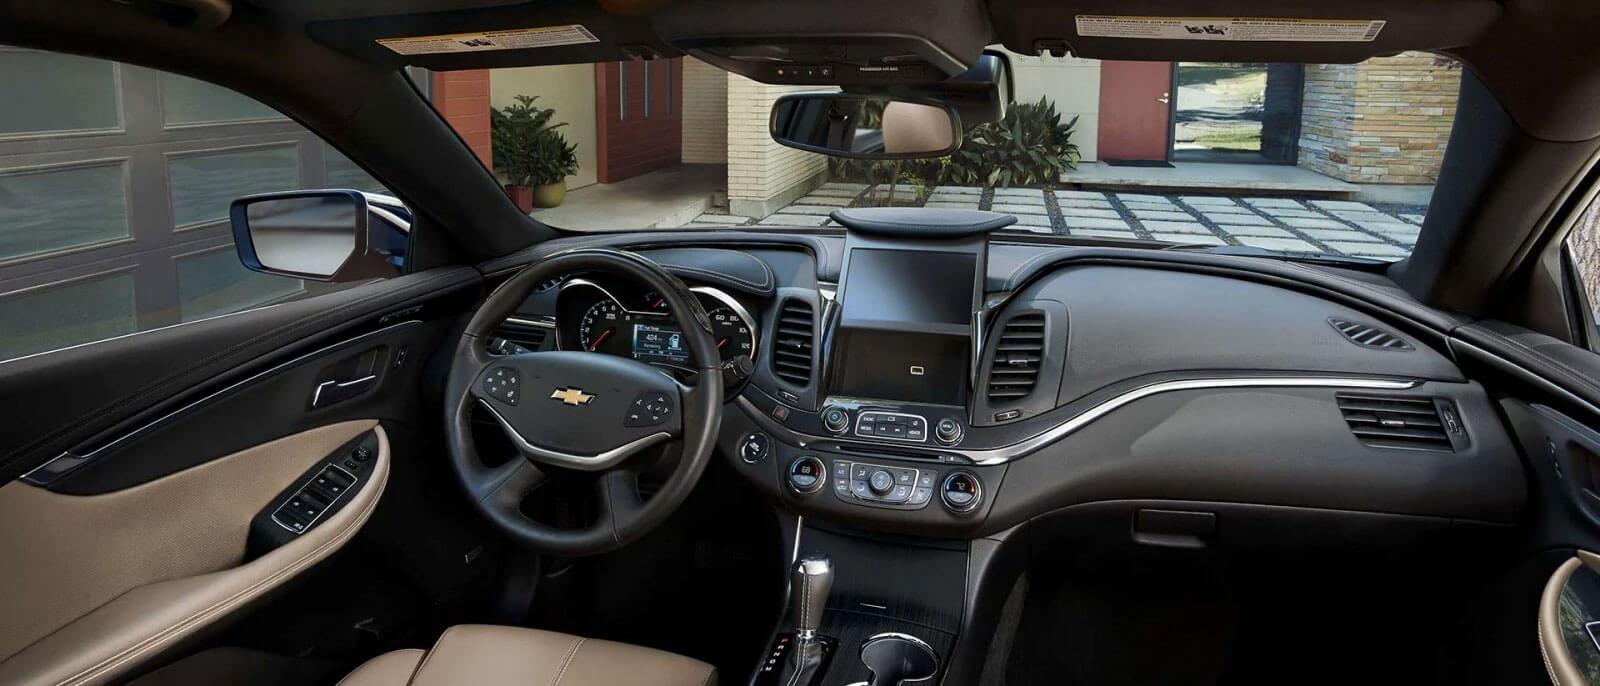 Explore The 2017 Chevrolet Impala 2003 Fuel Filter Interior